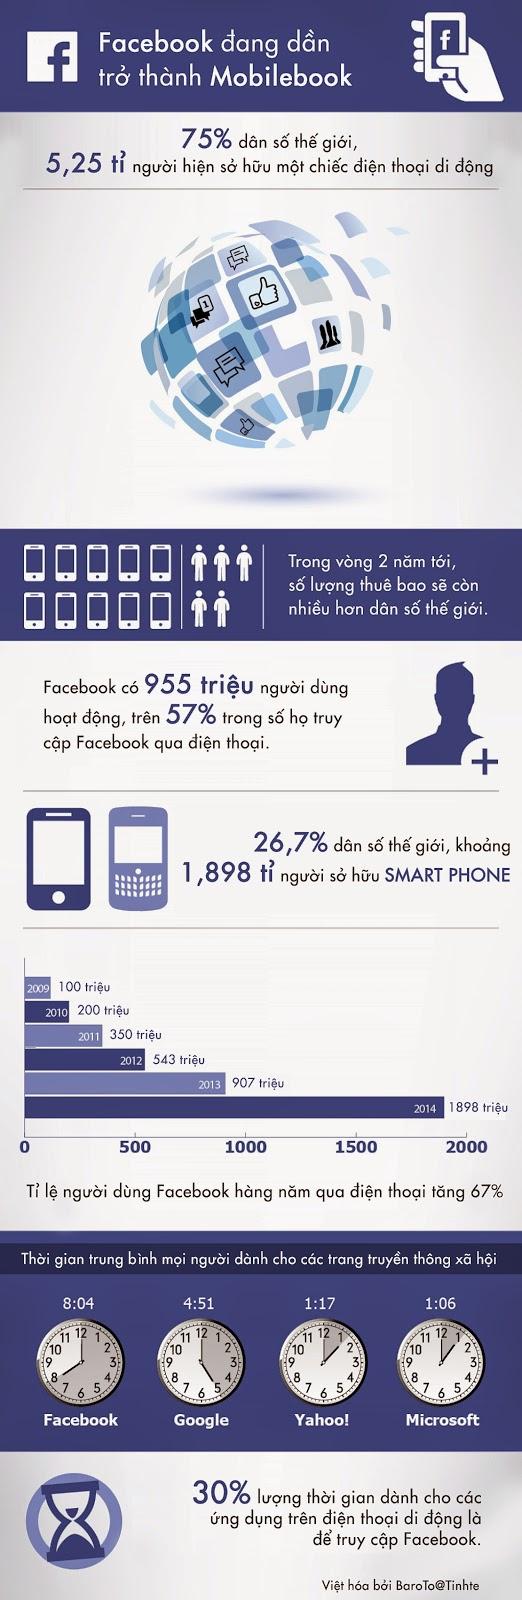 [Submit] facebook dang dan tro thanh mobile book.